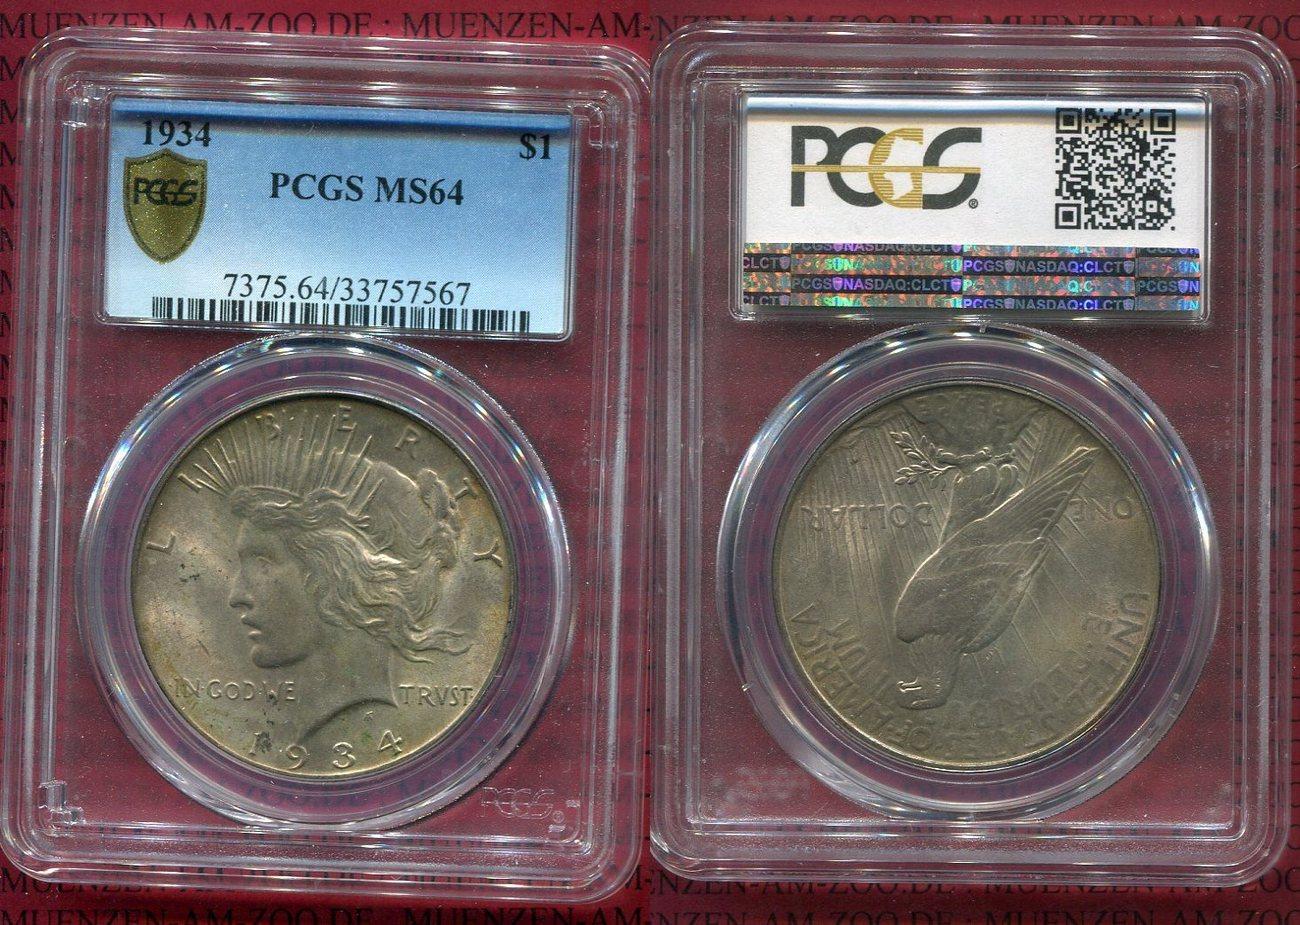 1 Dollar Silbermünze 1934 USA Peace Typ USA MS 64 PCGS holder